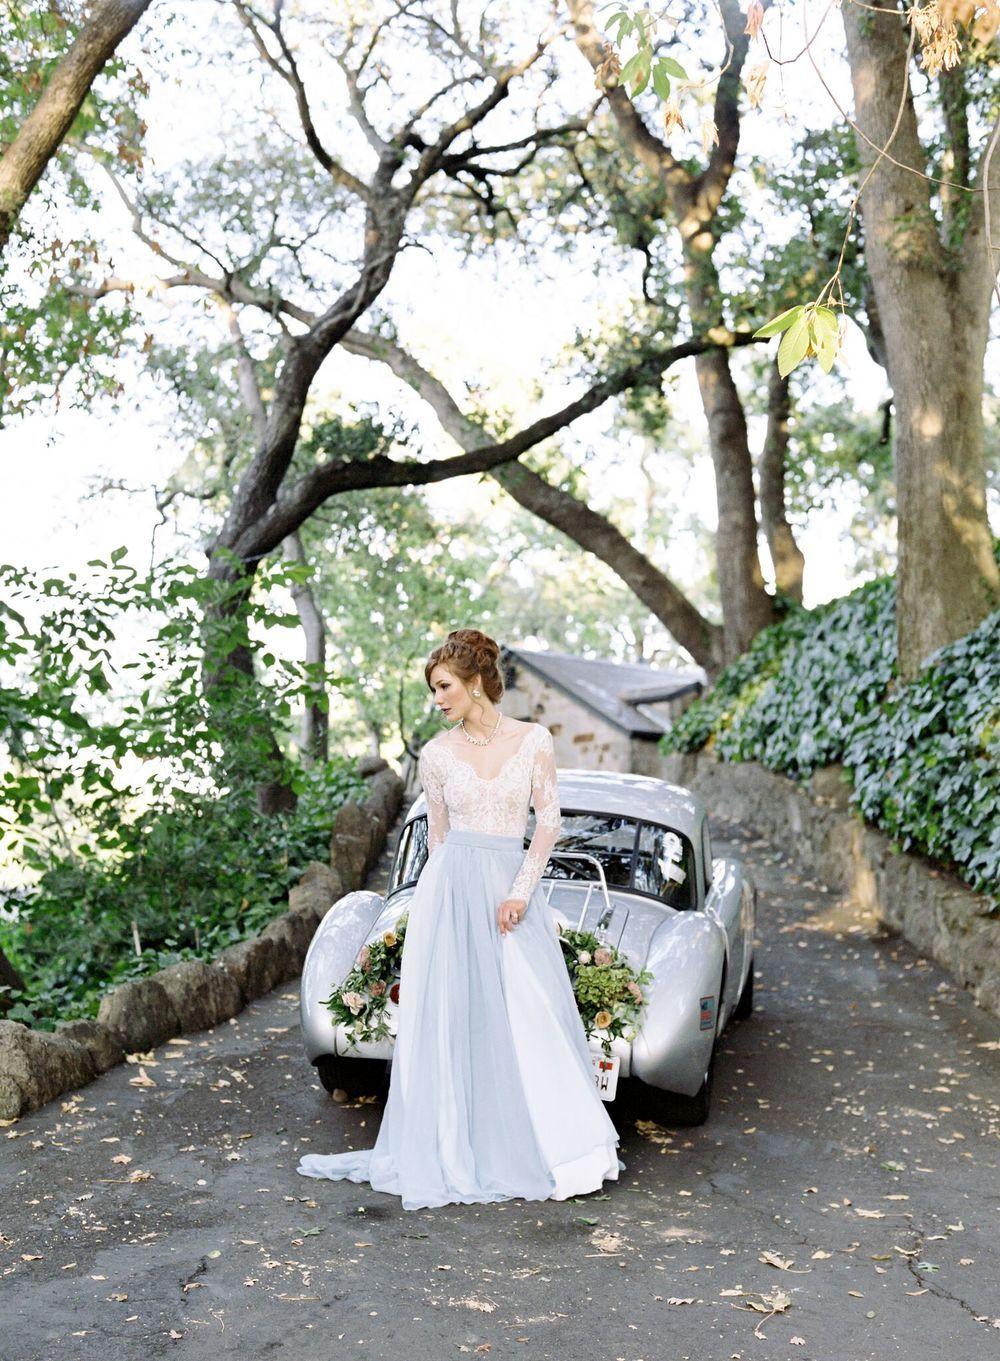 Elegant european wedding inspiration in napa valley wedding blogs